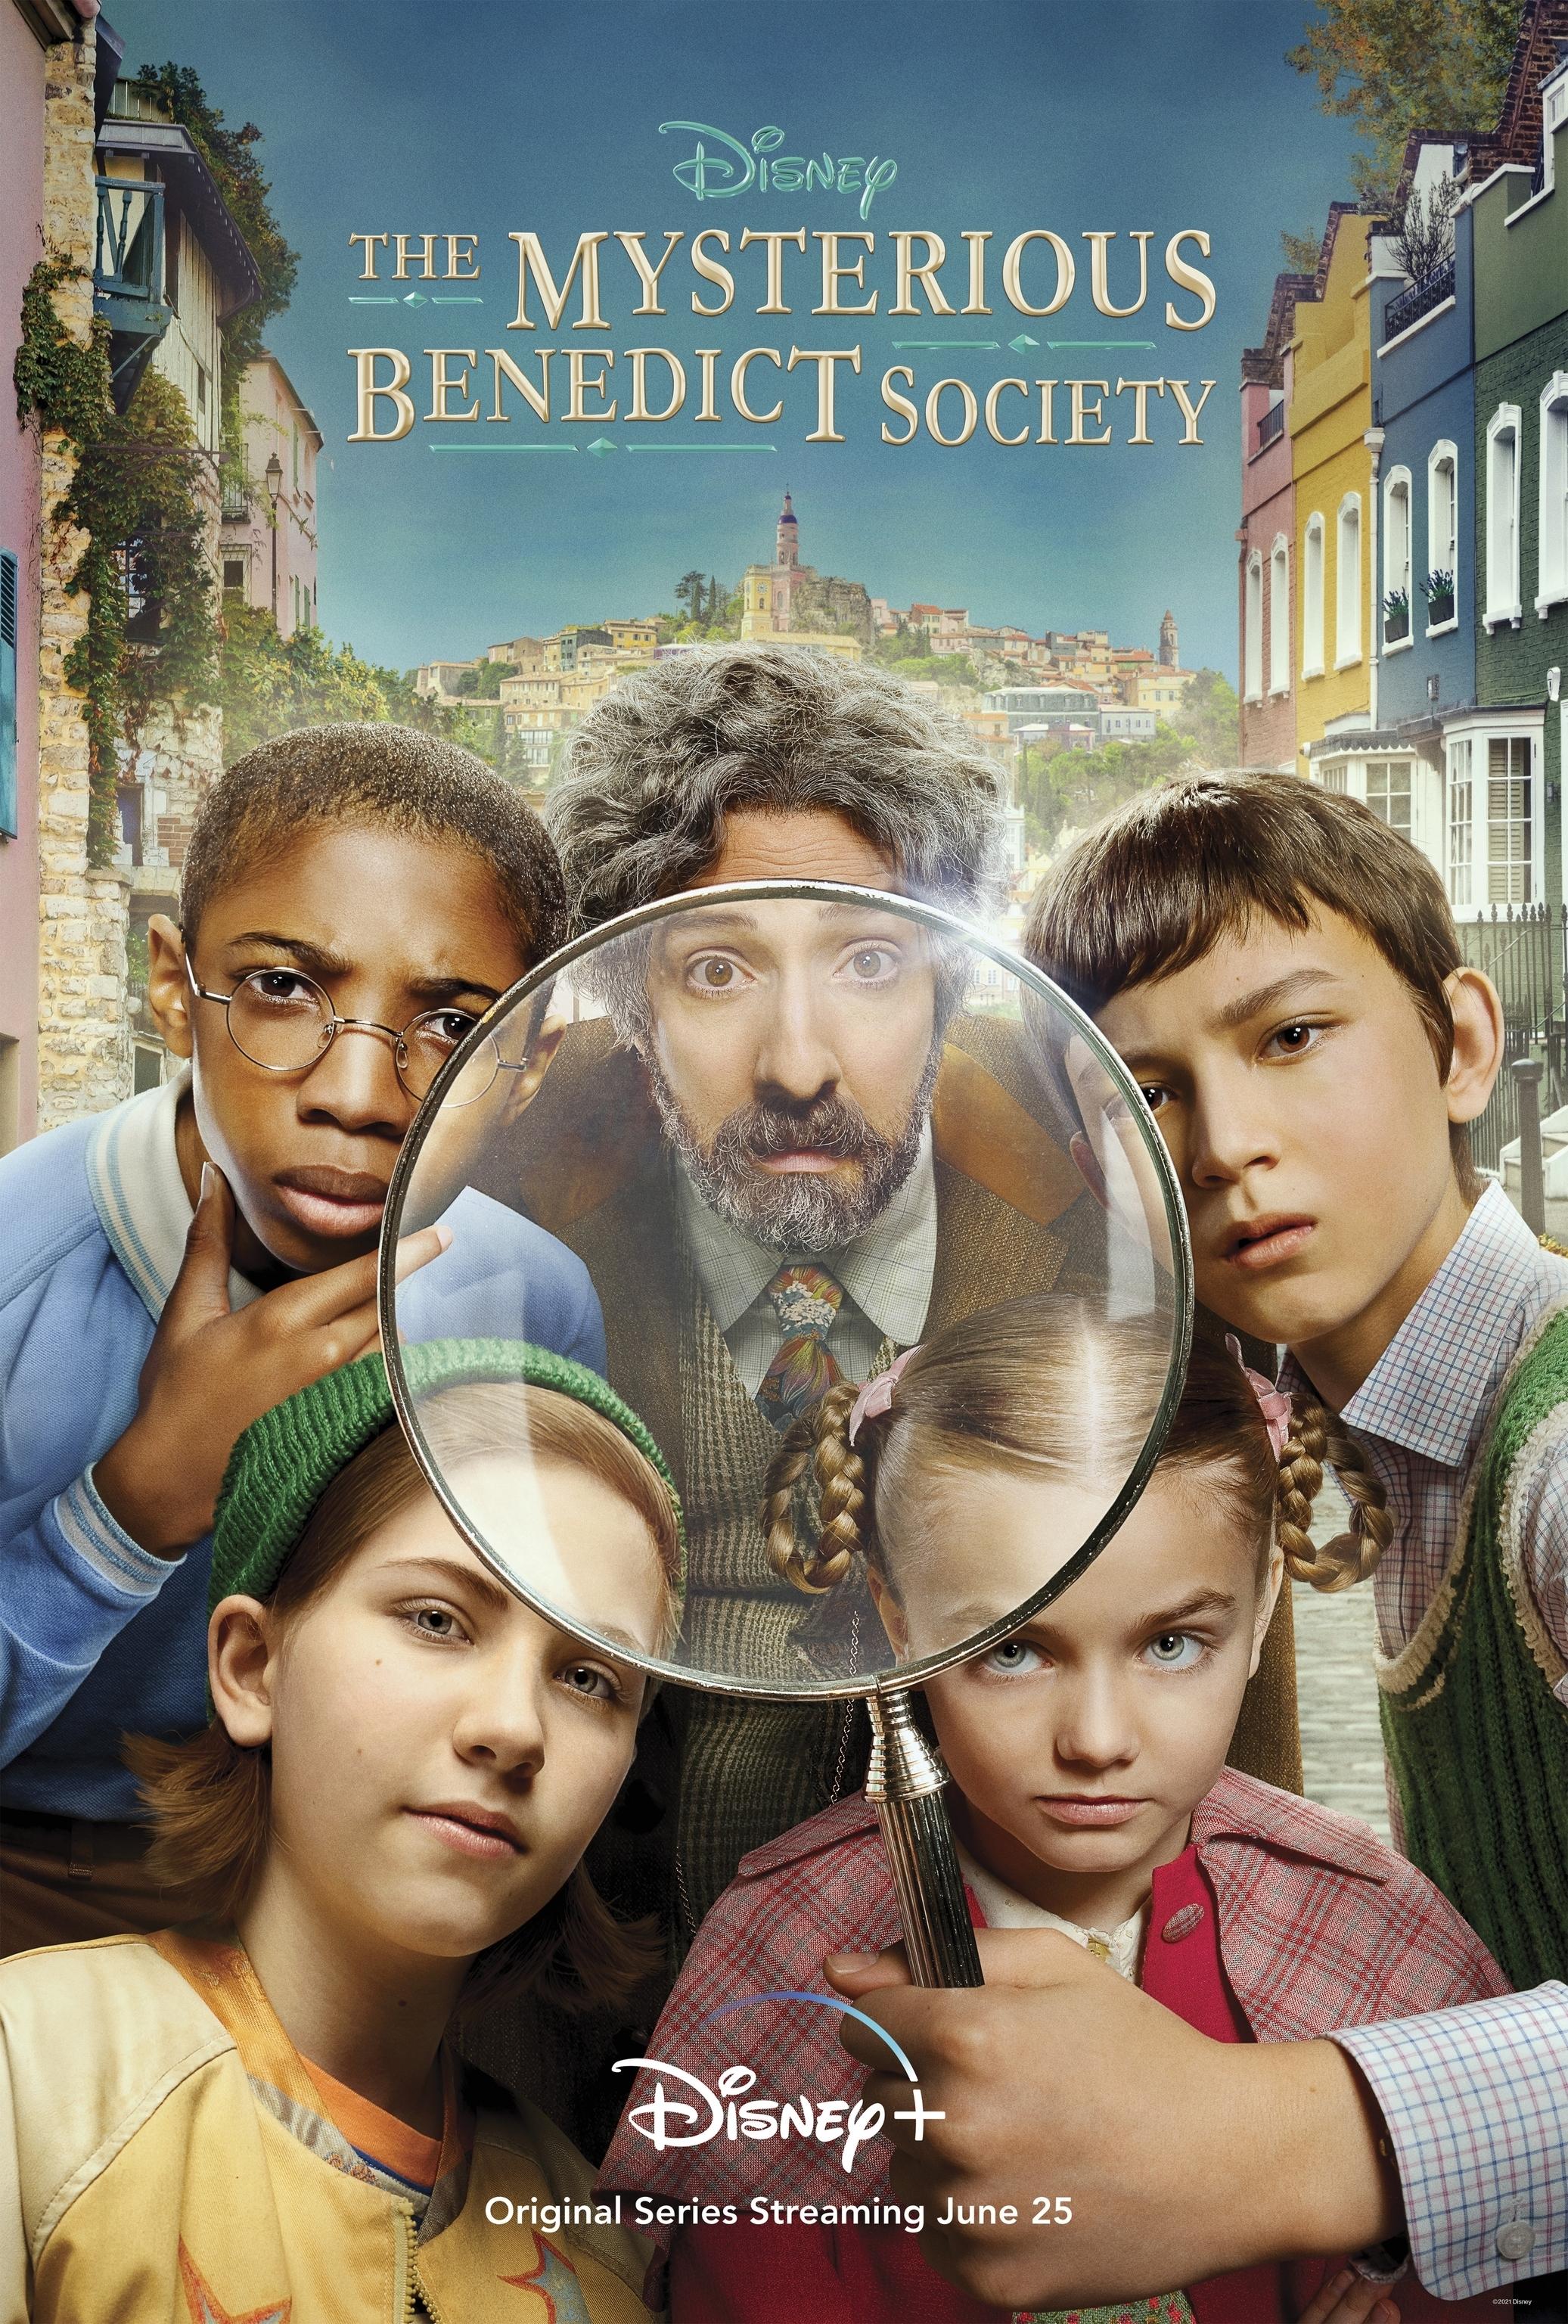 The Mysterious Benedict Society (TV Series 2021– ) - IMDb